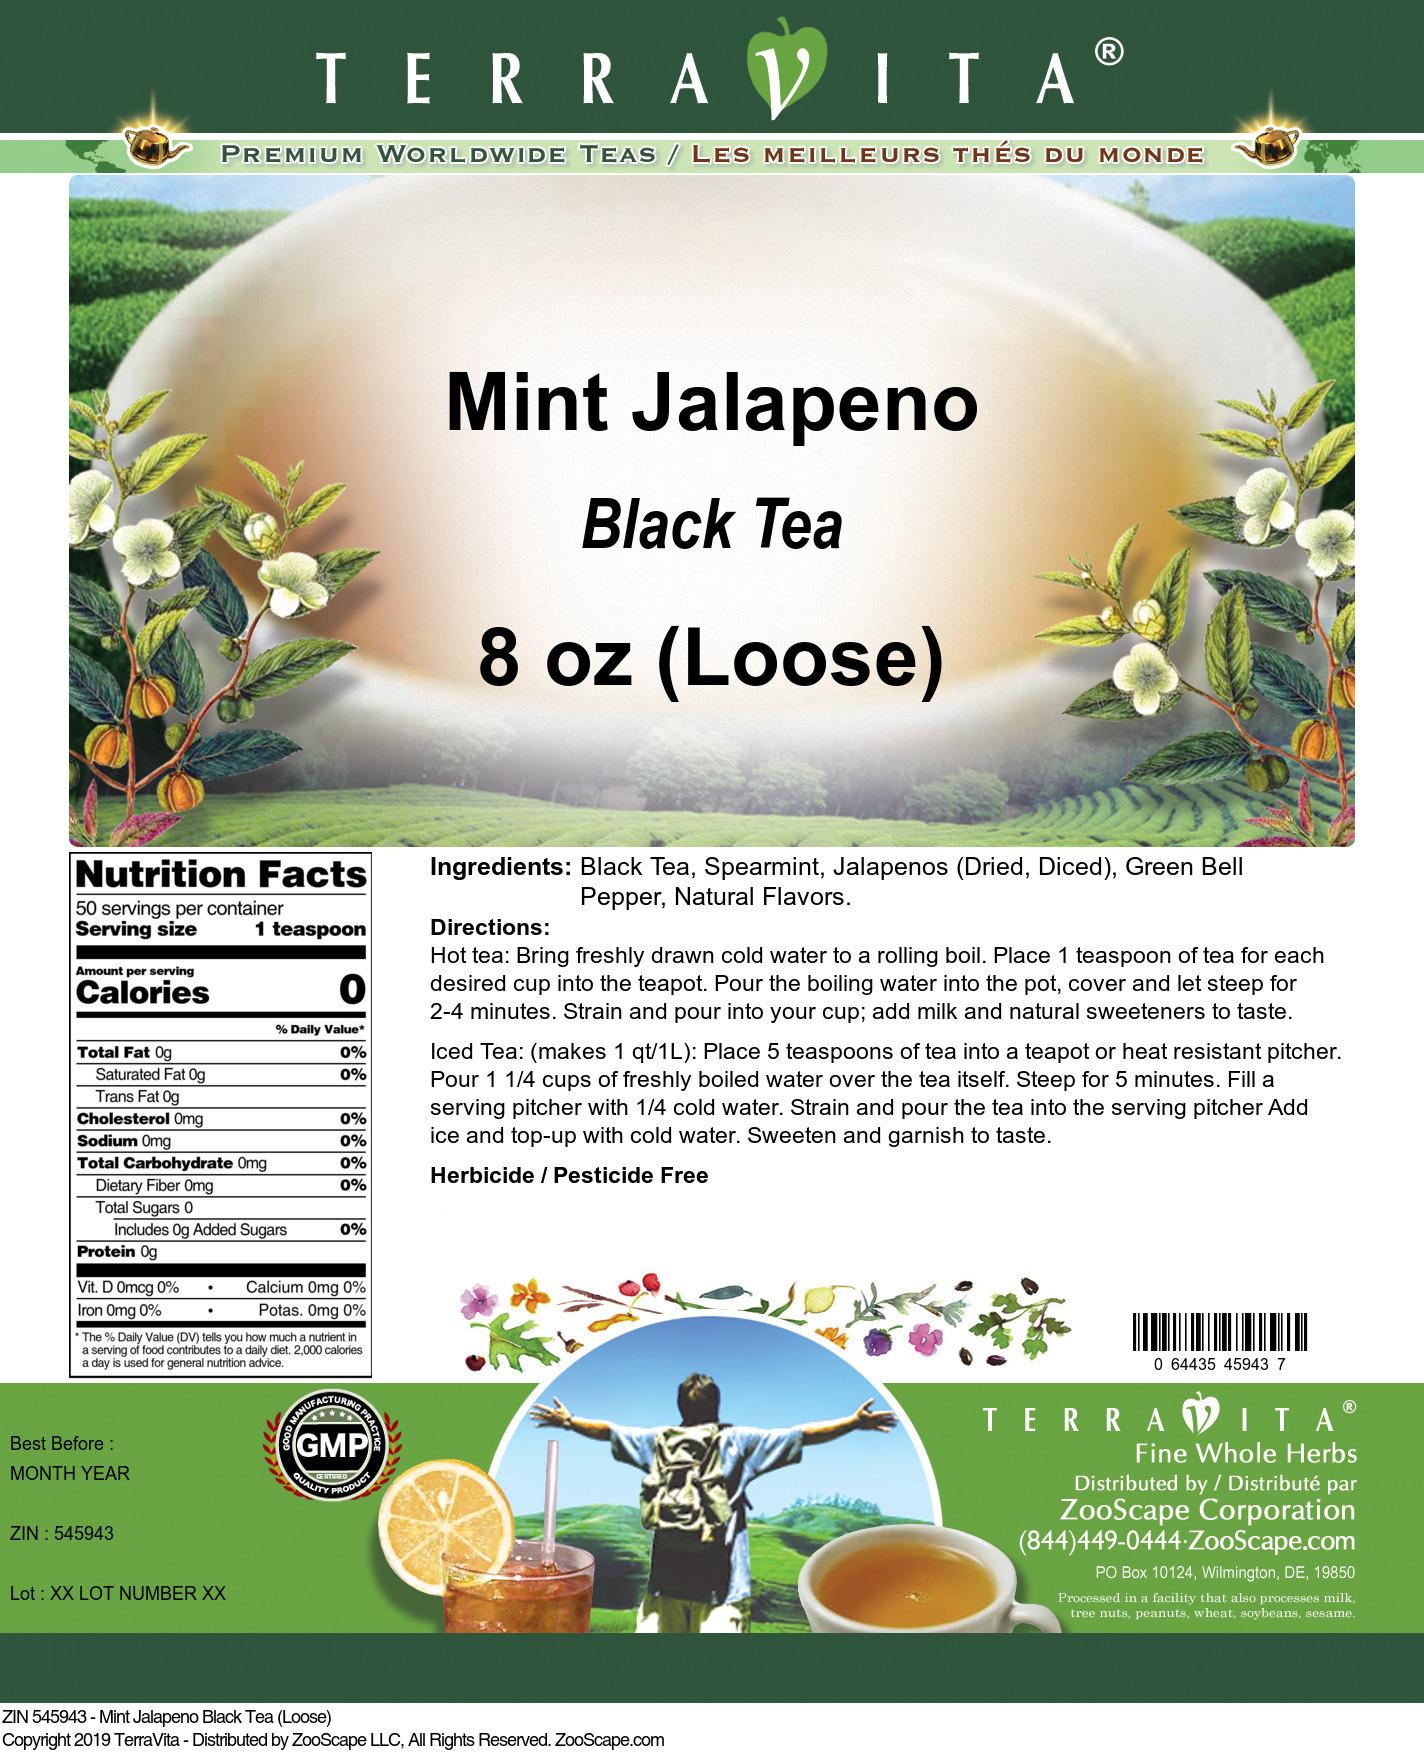 Mint Jalapeno Black Tea (Loose)